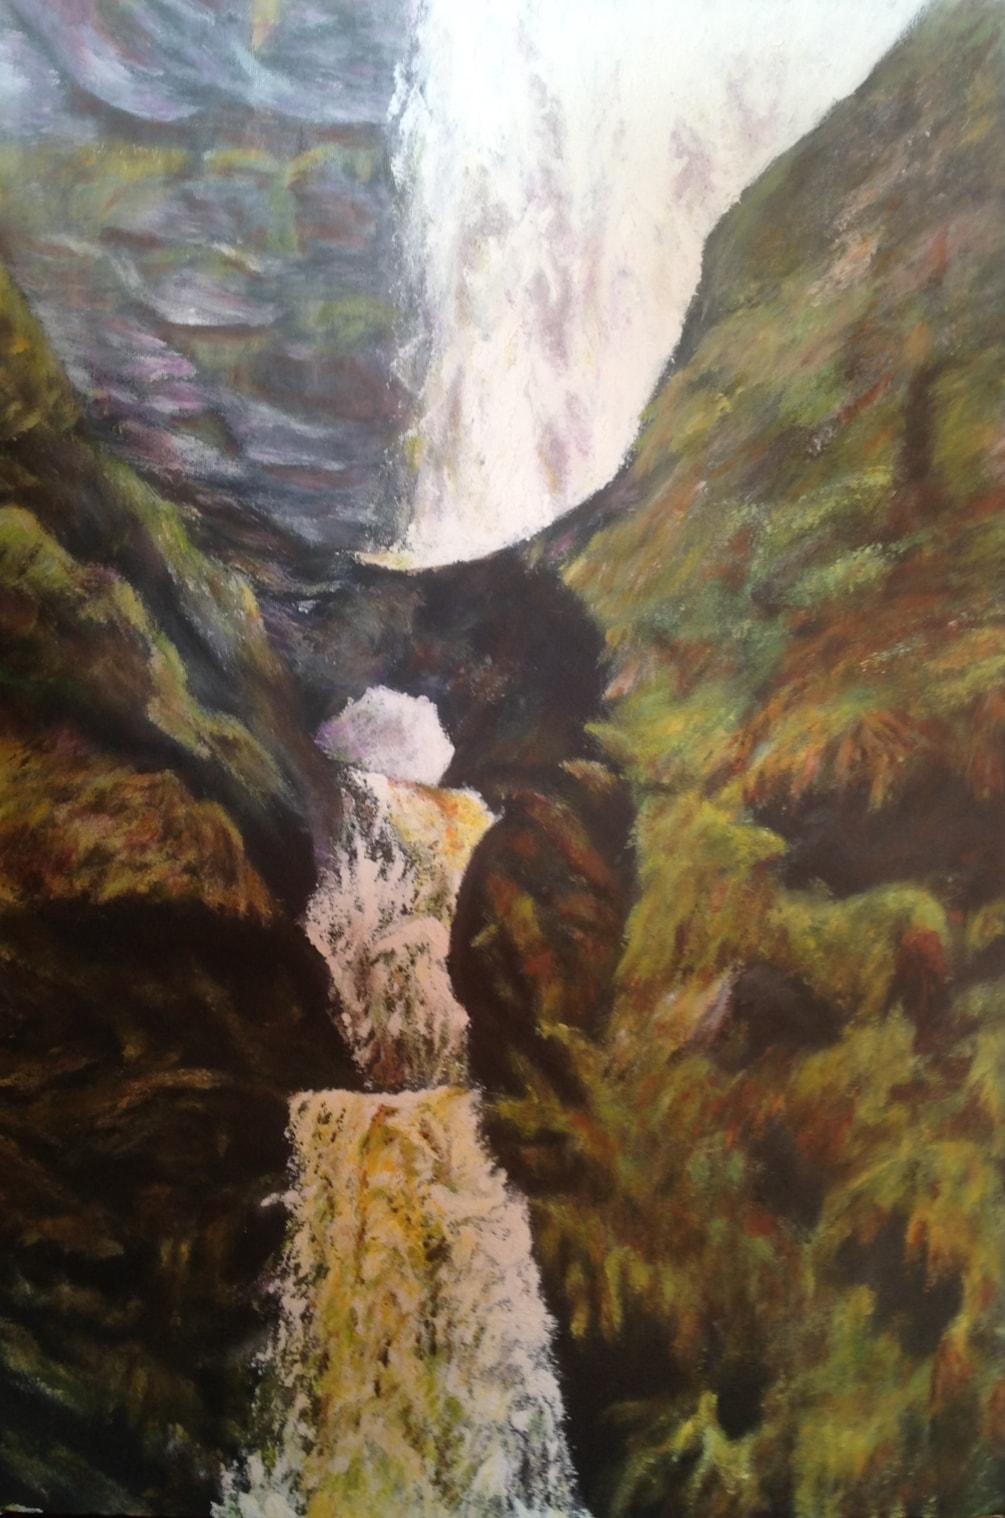 LLanrhaeadr Falls 2: Through the Bridge